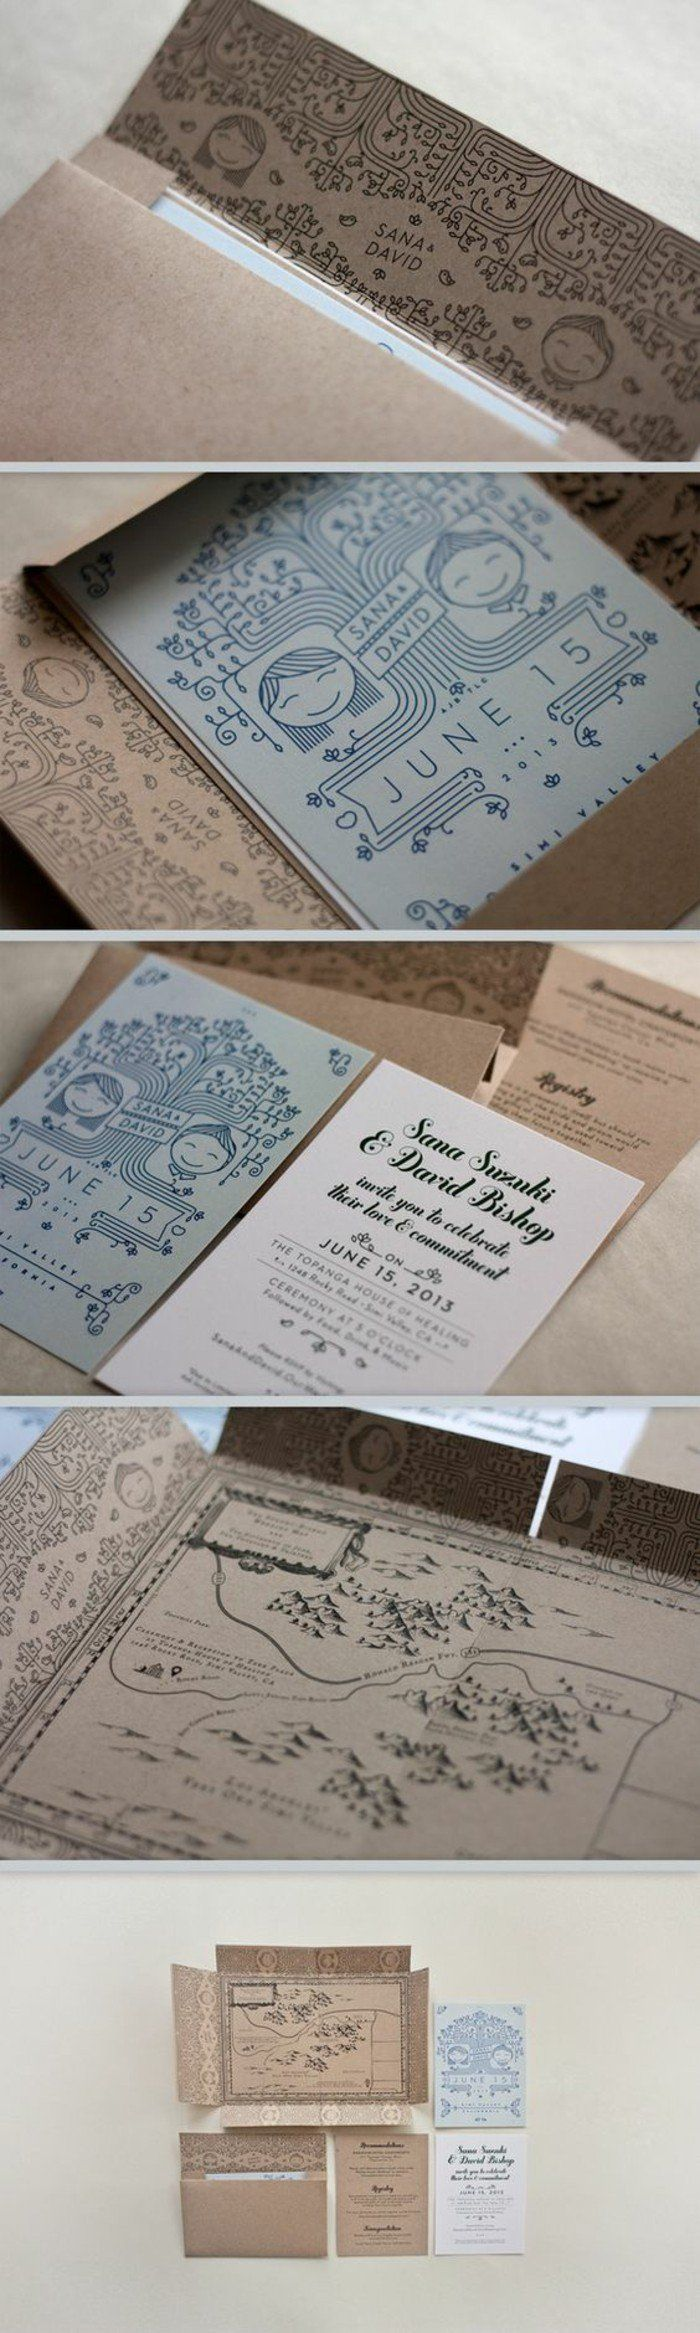 Best 25+ Original wedding invitations ideas on Pinterest   Rustic ...